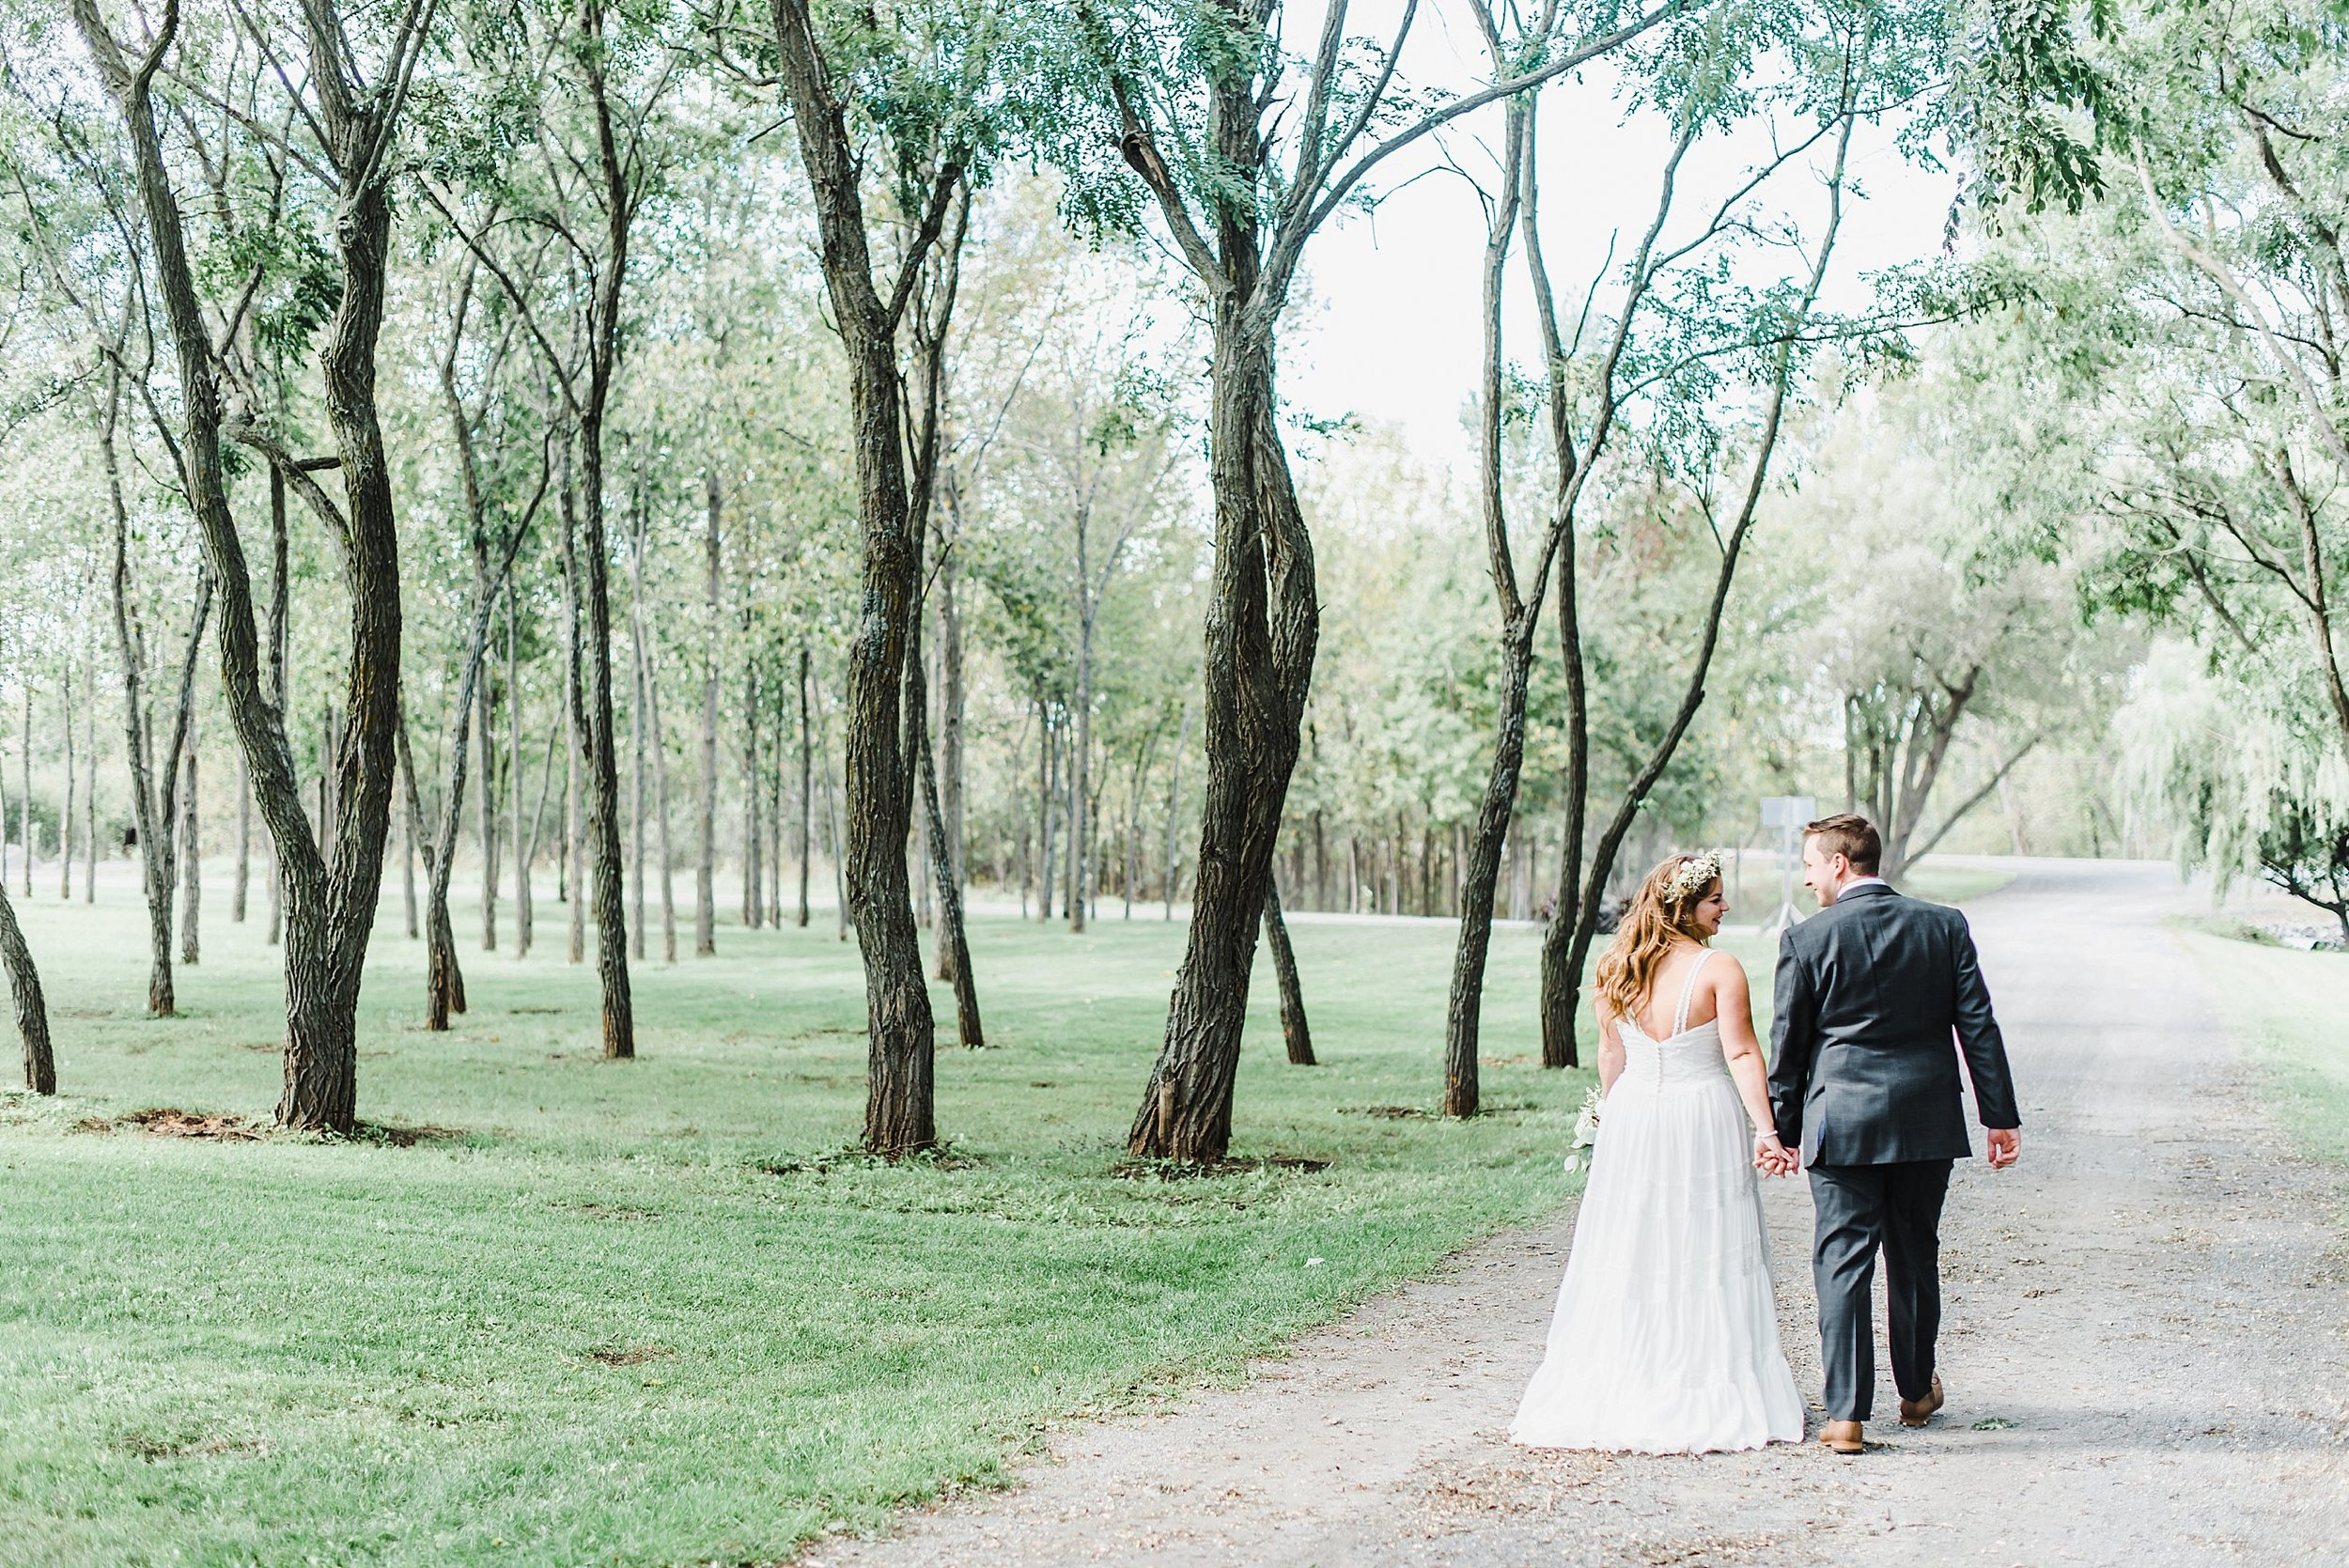 light airy indie fine art ottawa wedding photographer | Ali and Batoul Photography_1094.jpg